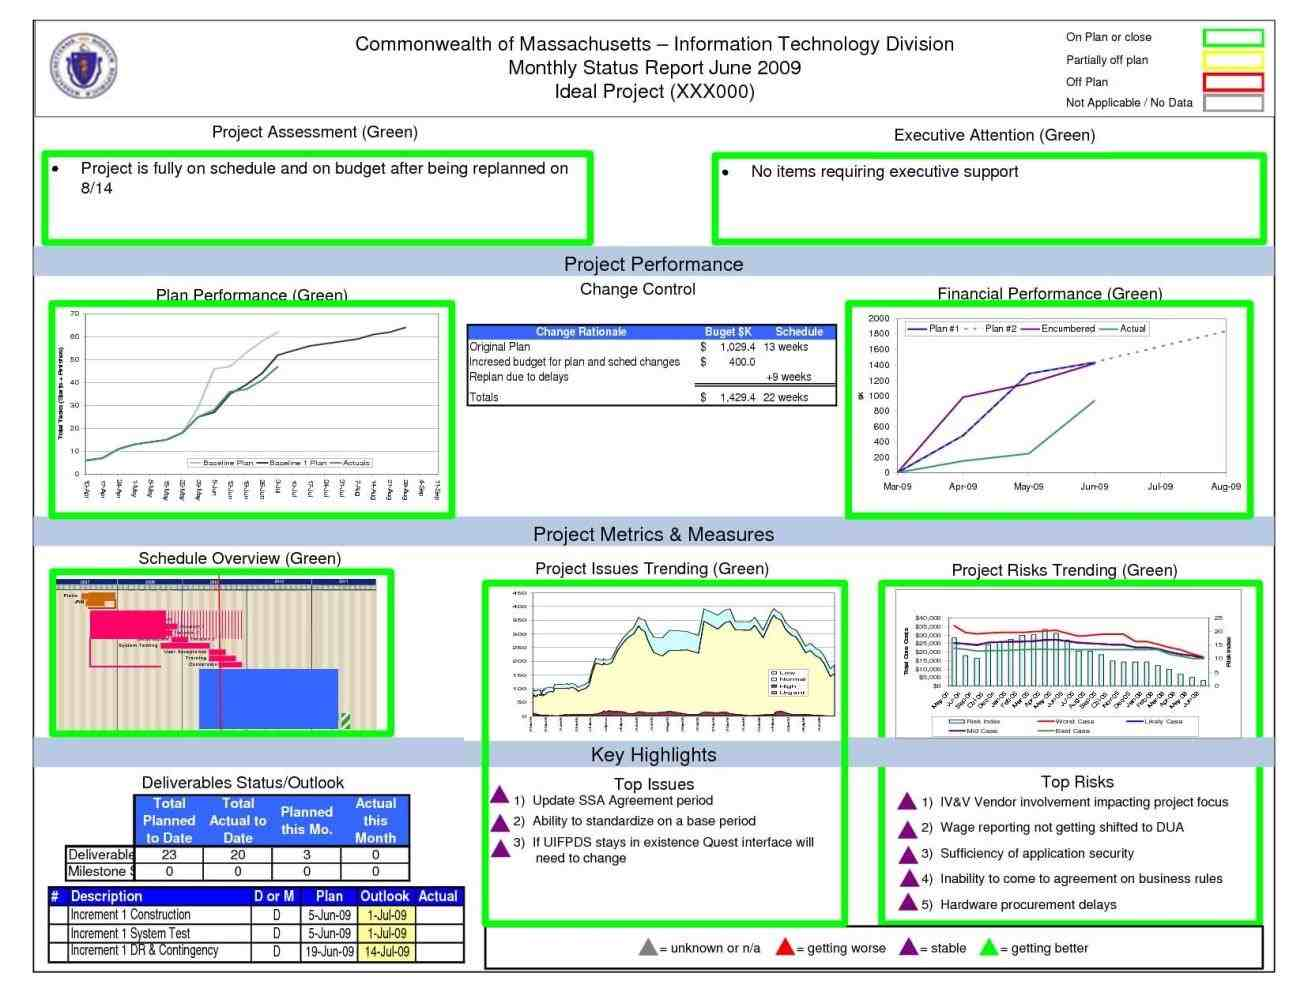 dashboard templates excel resumerhweeklyresumesco retail analysis sample for power bi take a tour rhdocsmicrosoftcom retail Simple Excel Dashboard Templates analysis sample